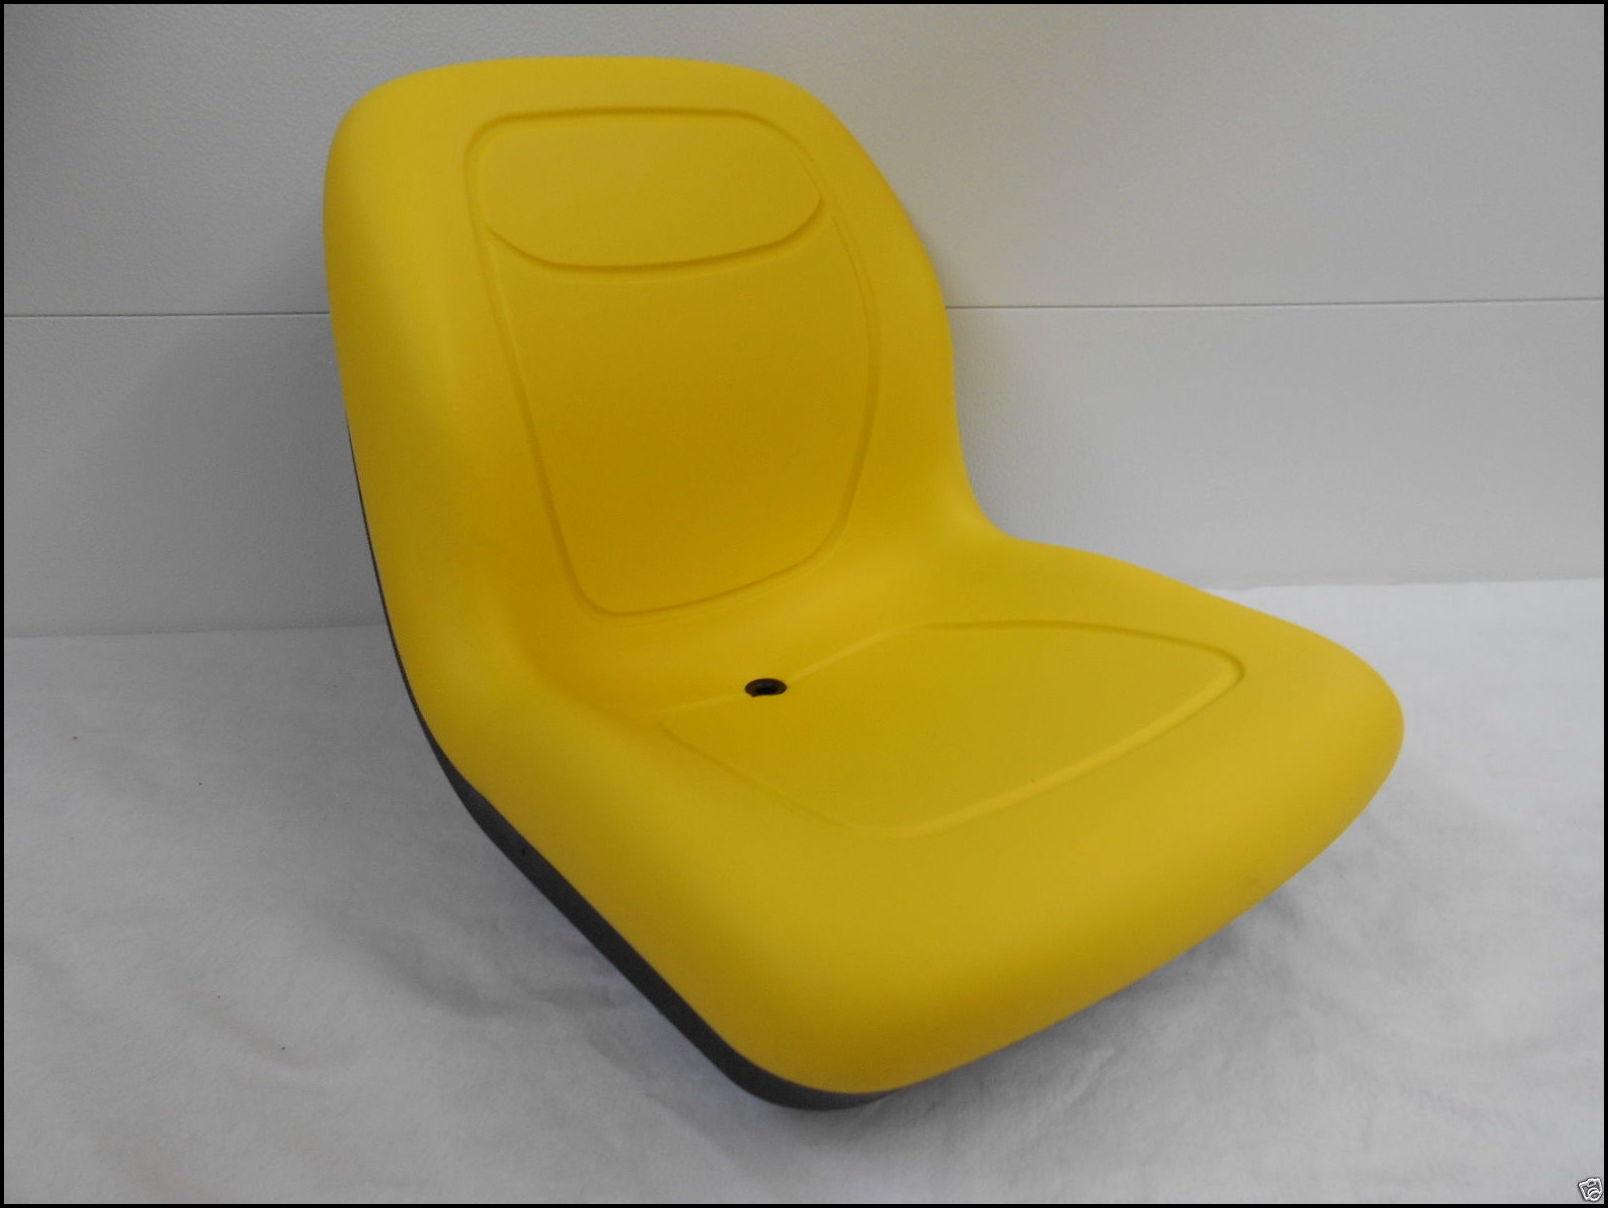 John Deere Lawn Mower Seat